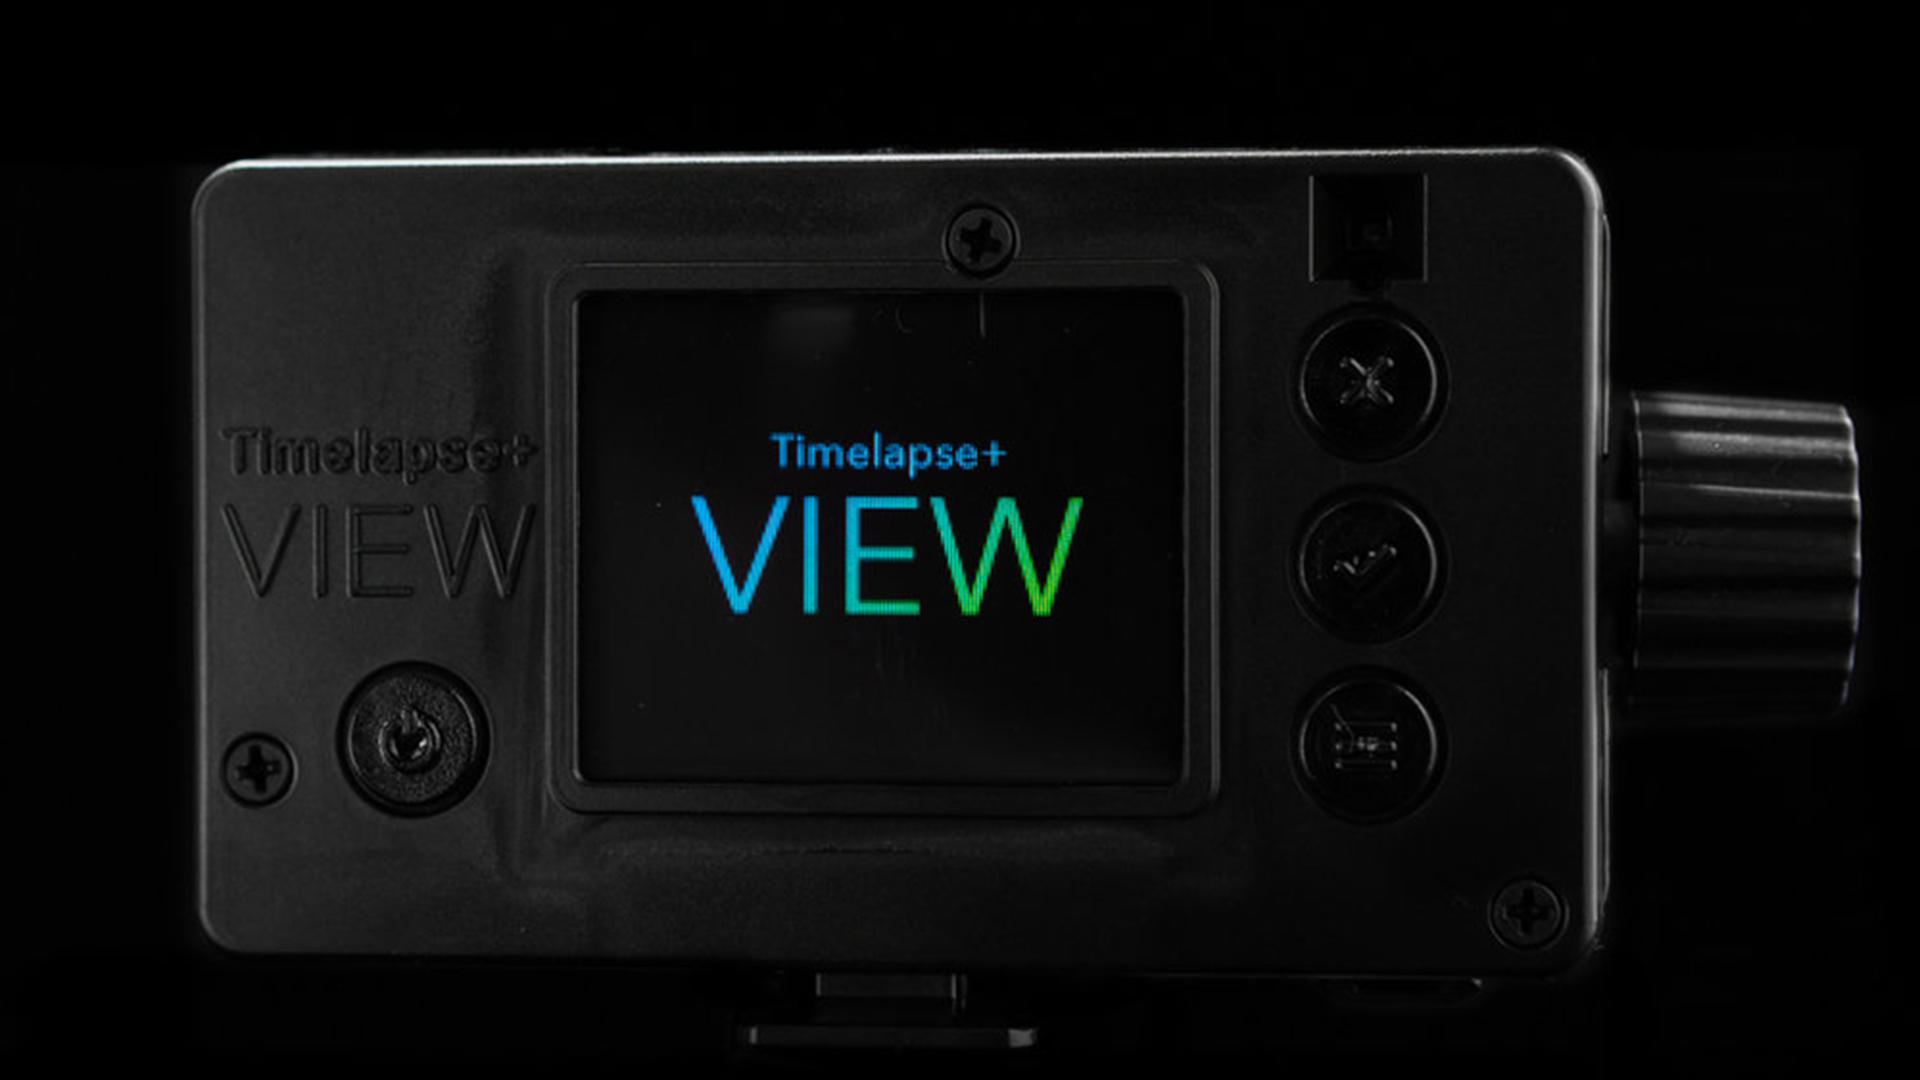 Timelapse+ VIEW agrega soporte para la serie FUJIFILM X